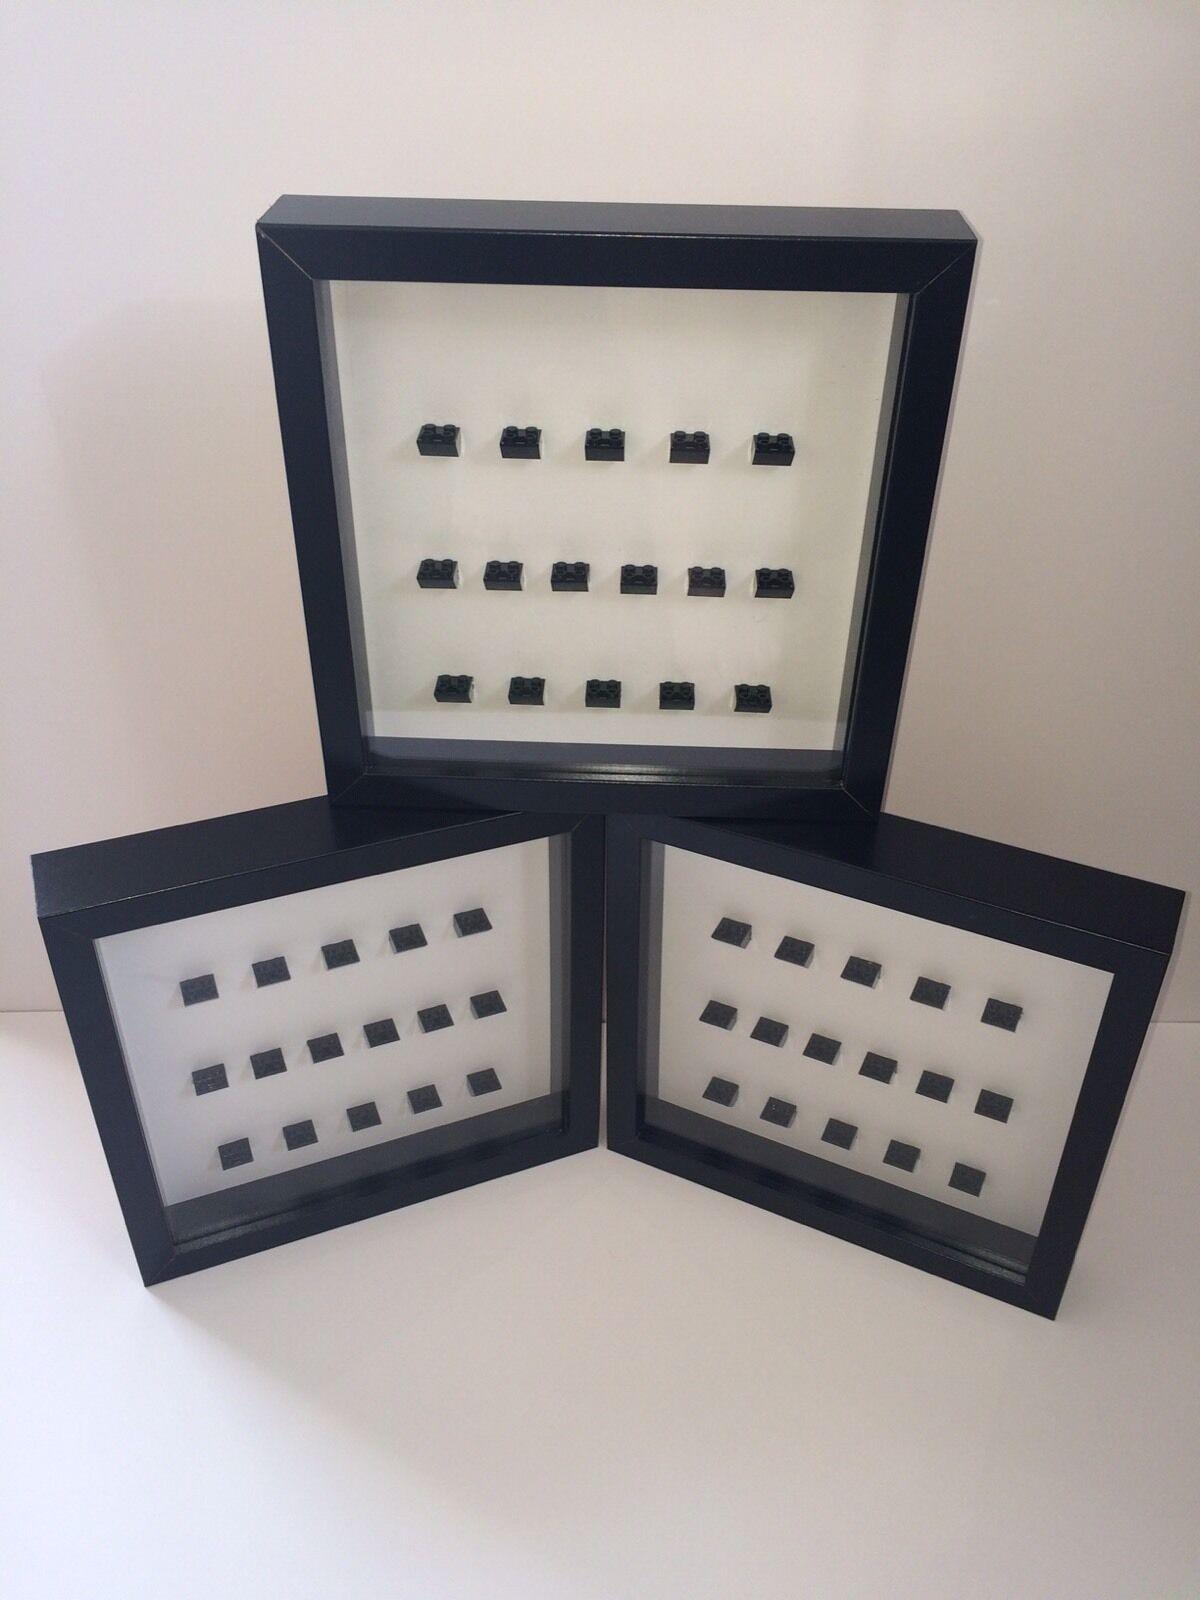 3 X Nero Display Frame per 16 x Lego minifigures.  minifigures sono non incluso